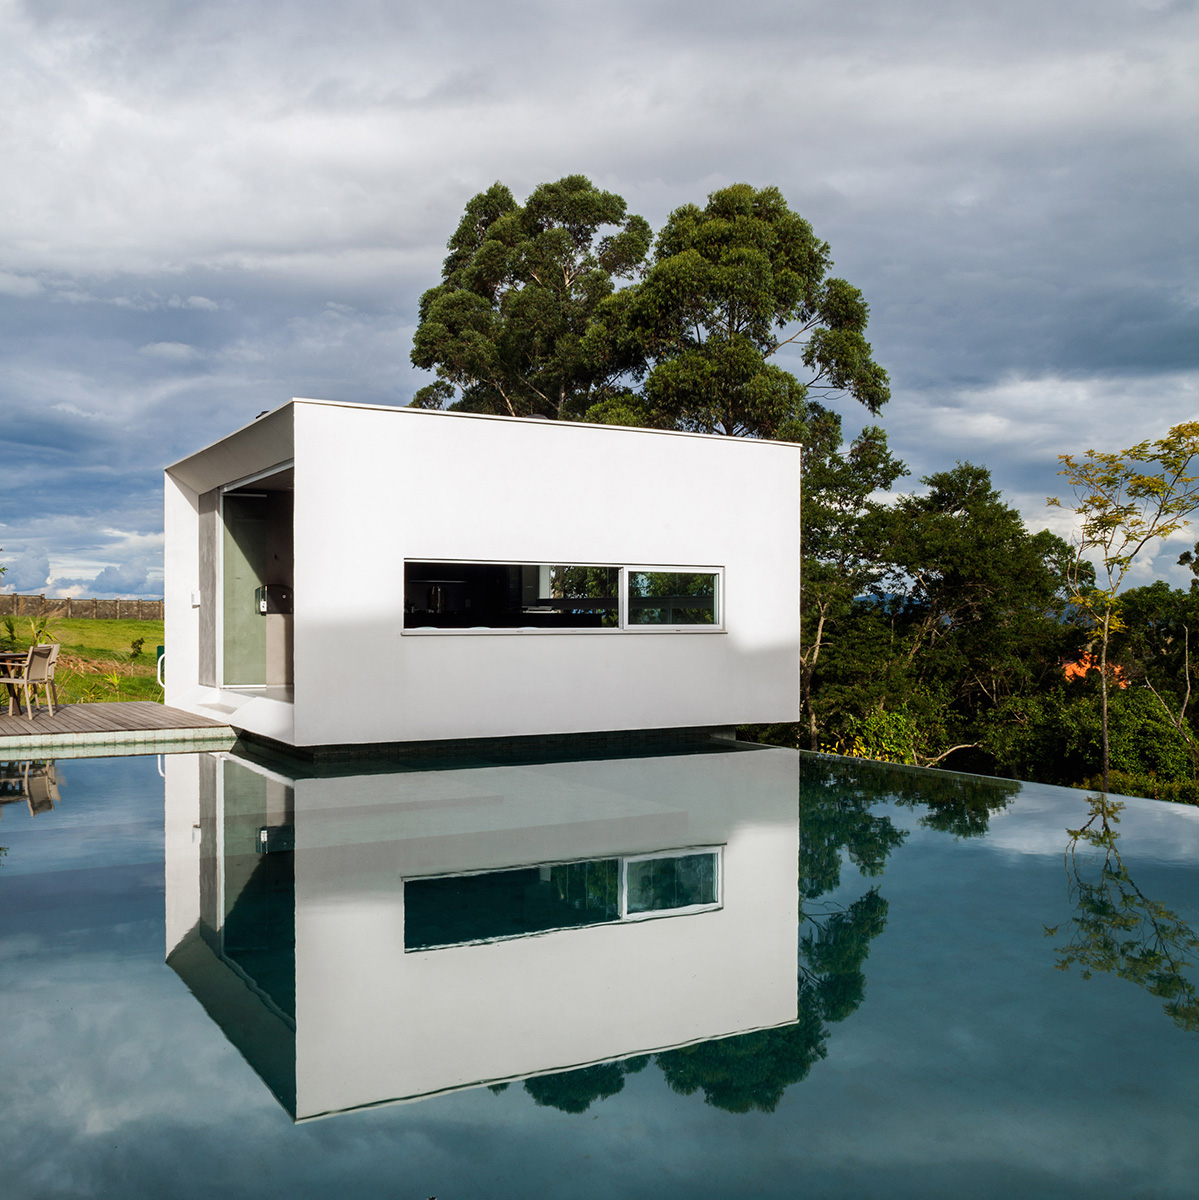 Casa-Neblina-FGMF-Arquitetos-Rafaela-Netto-08